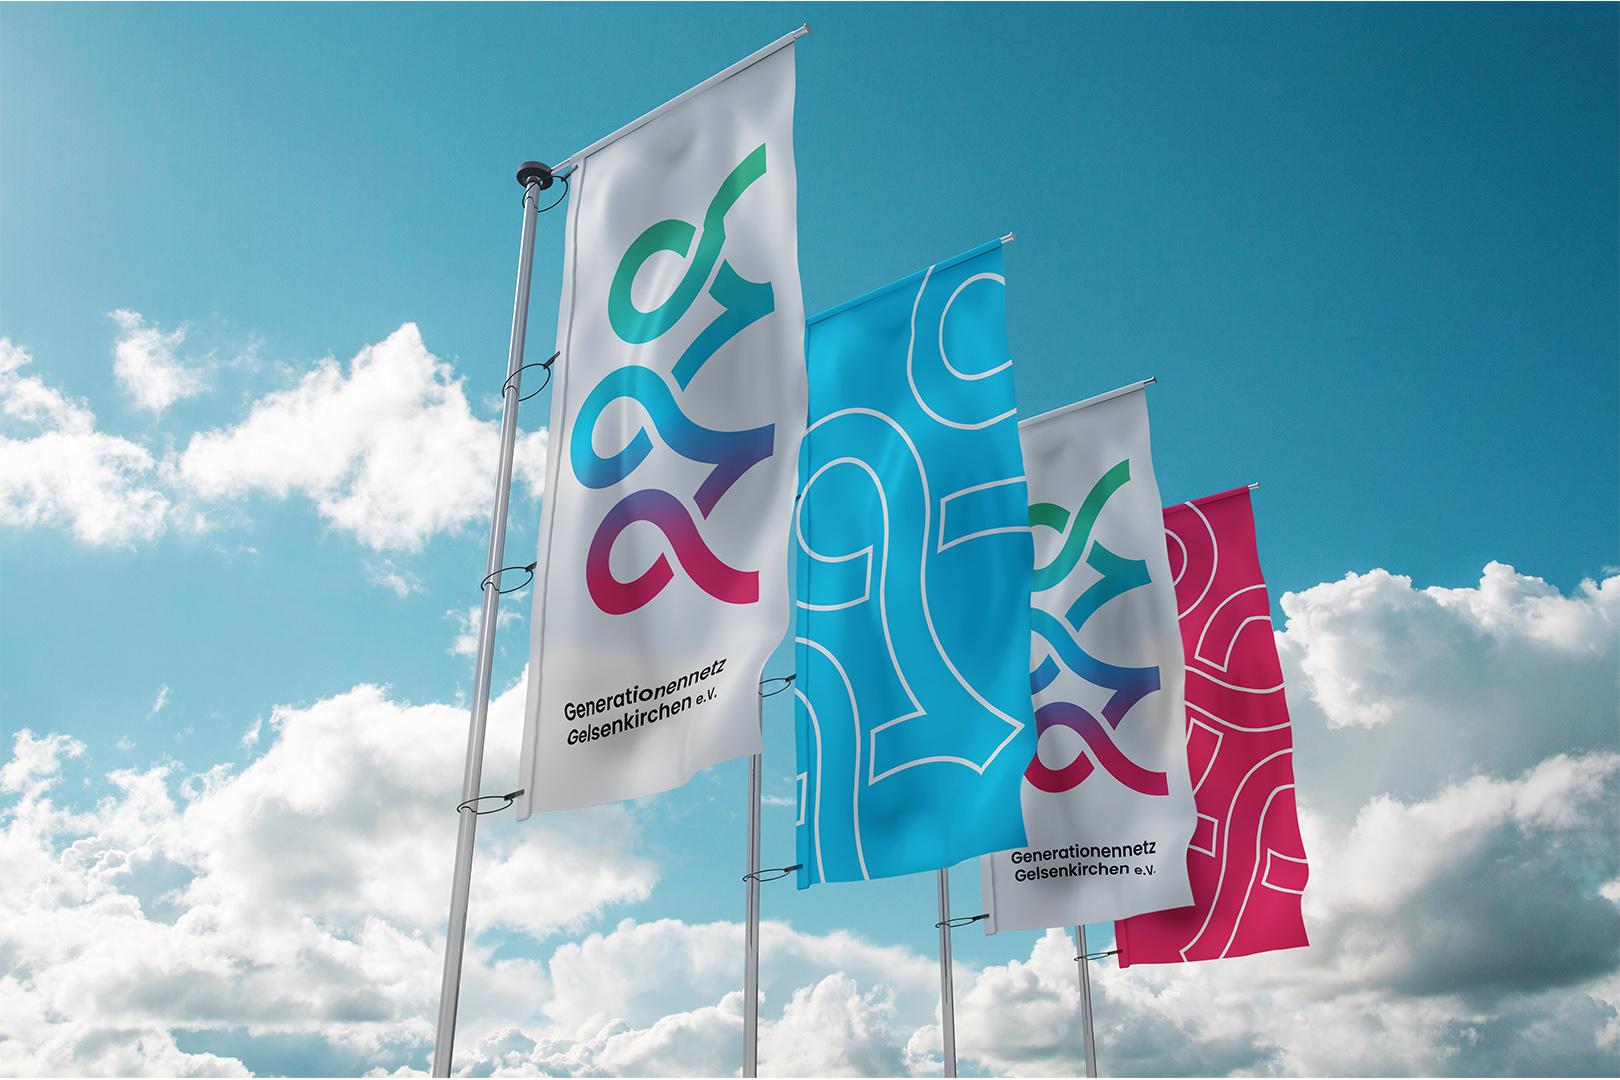 Flaggen im neuen Design des Generationennetz Gelsenkirchen e.V.